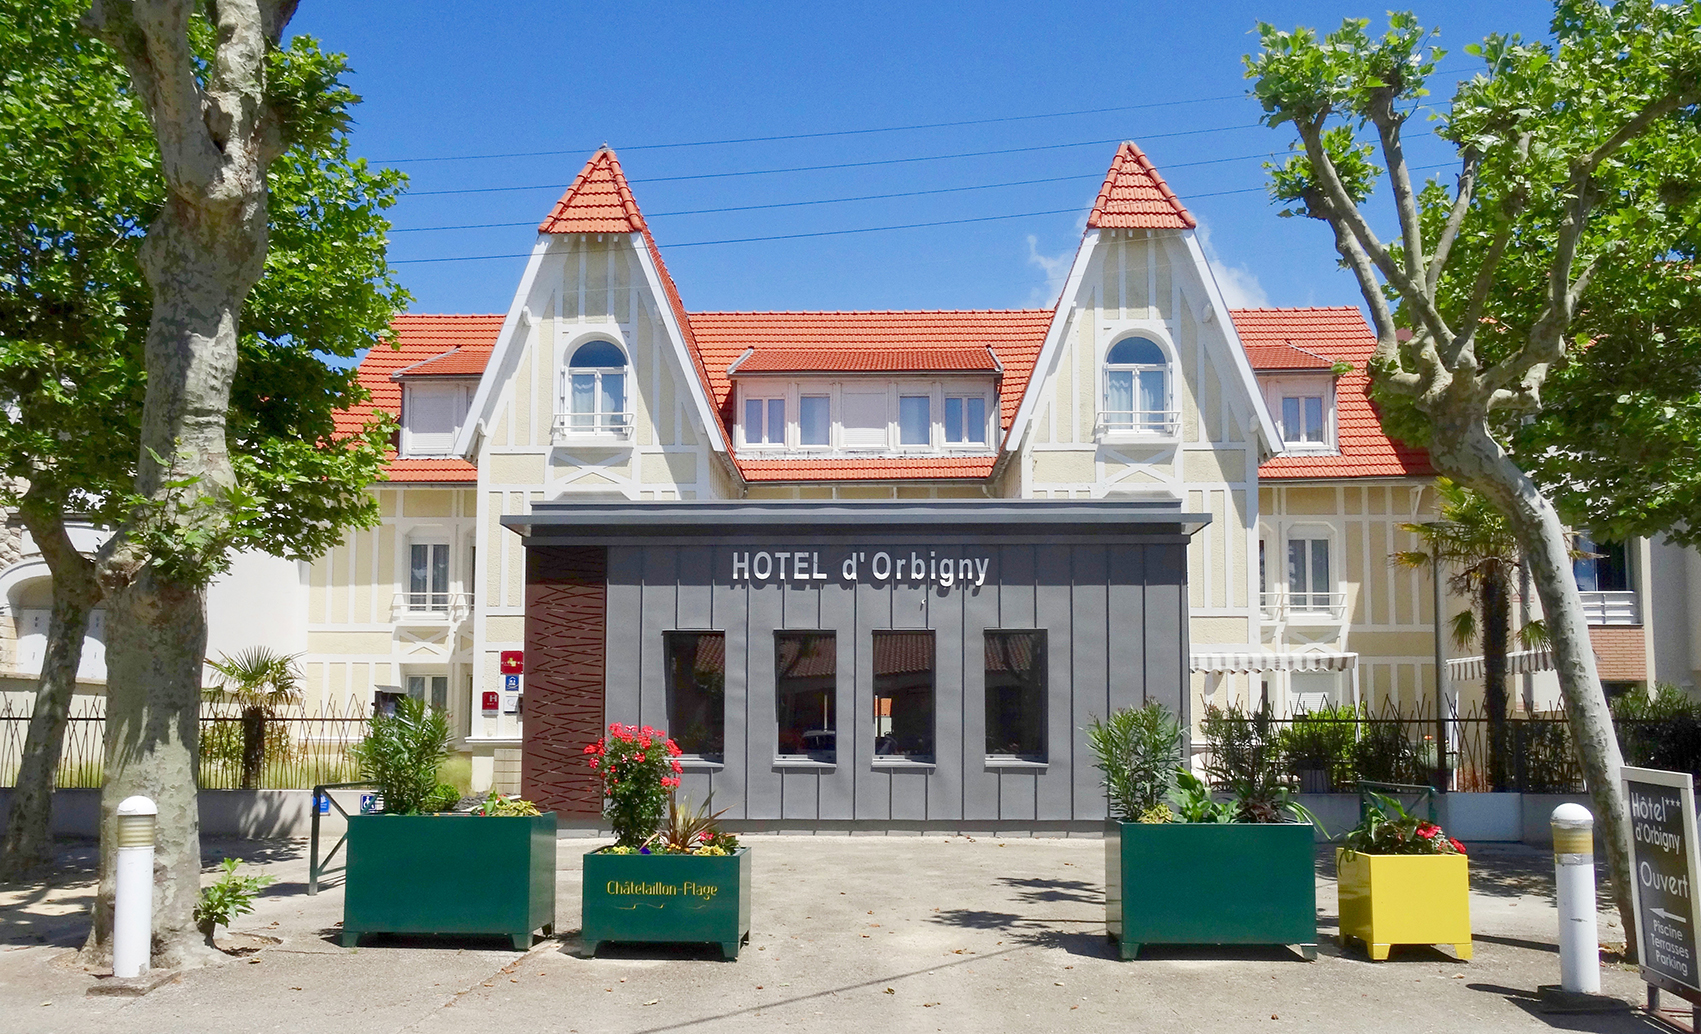 Chatelaillon Plage – Hôtel d'Orbigny